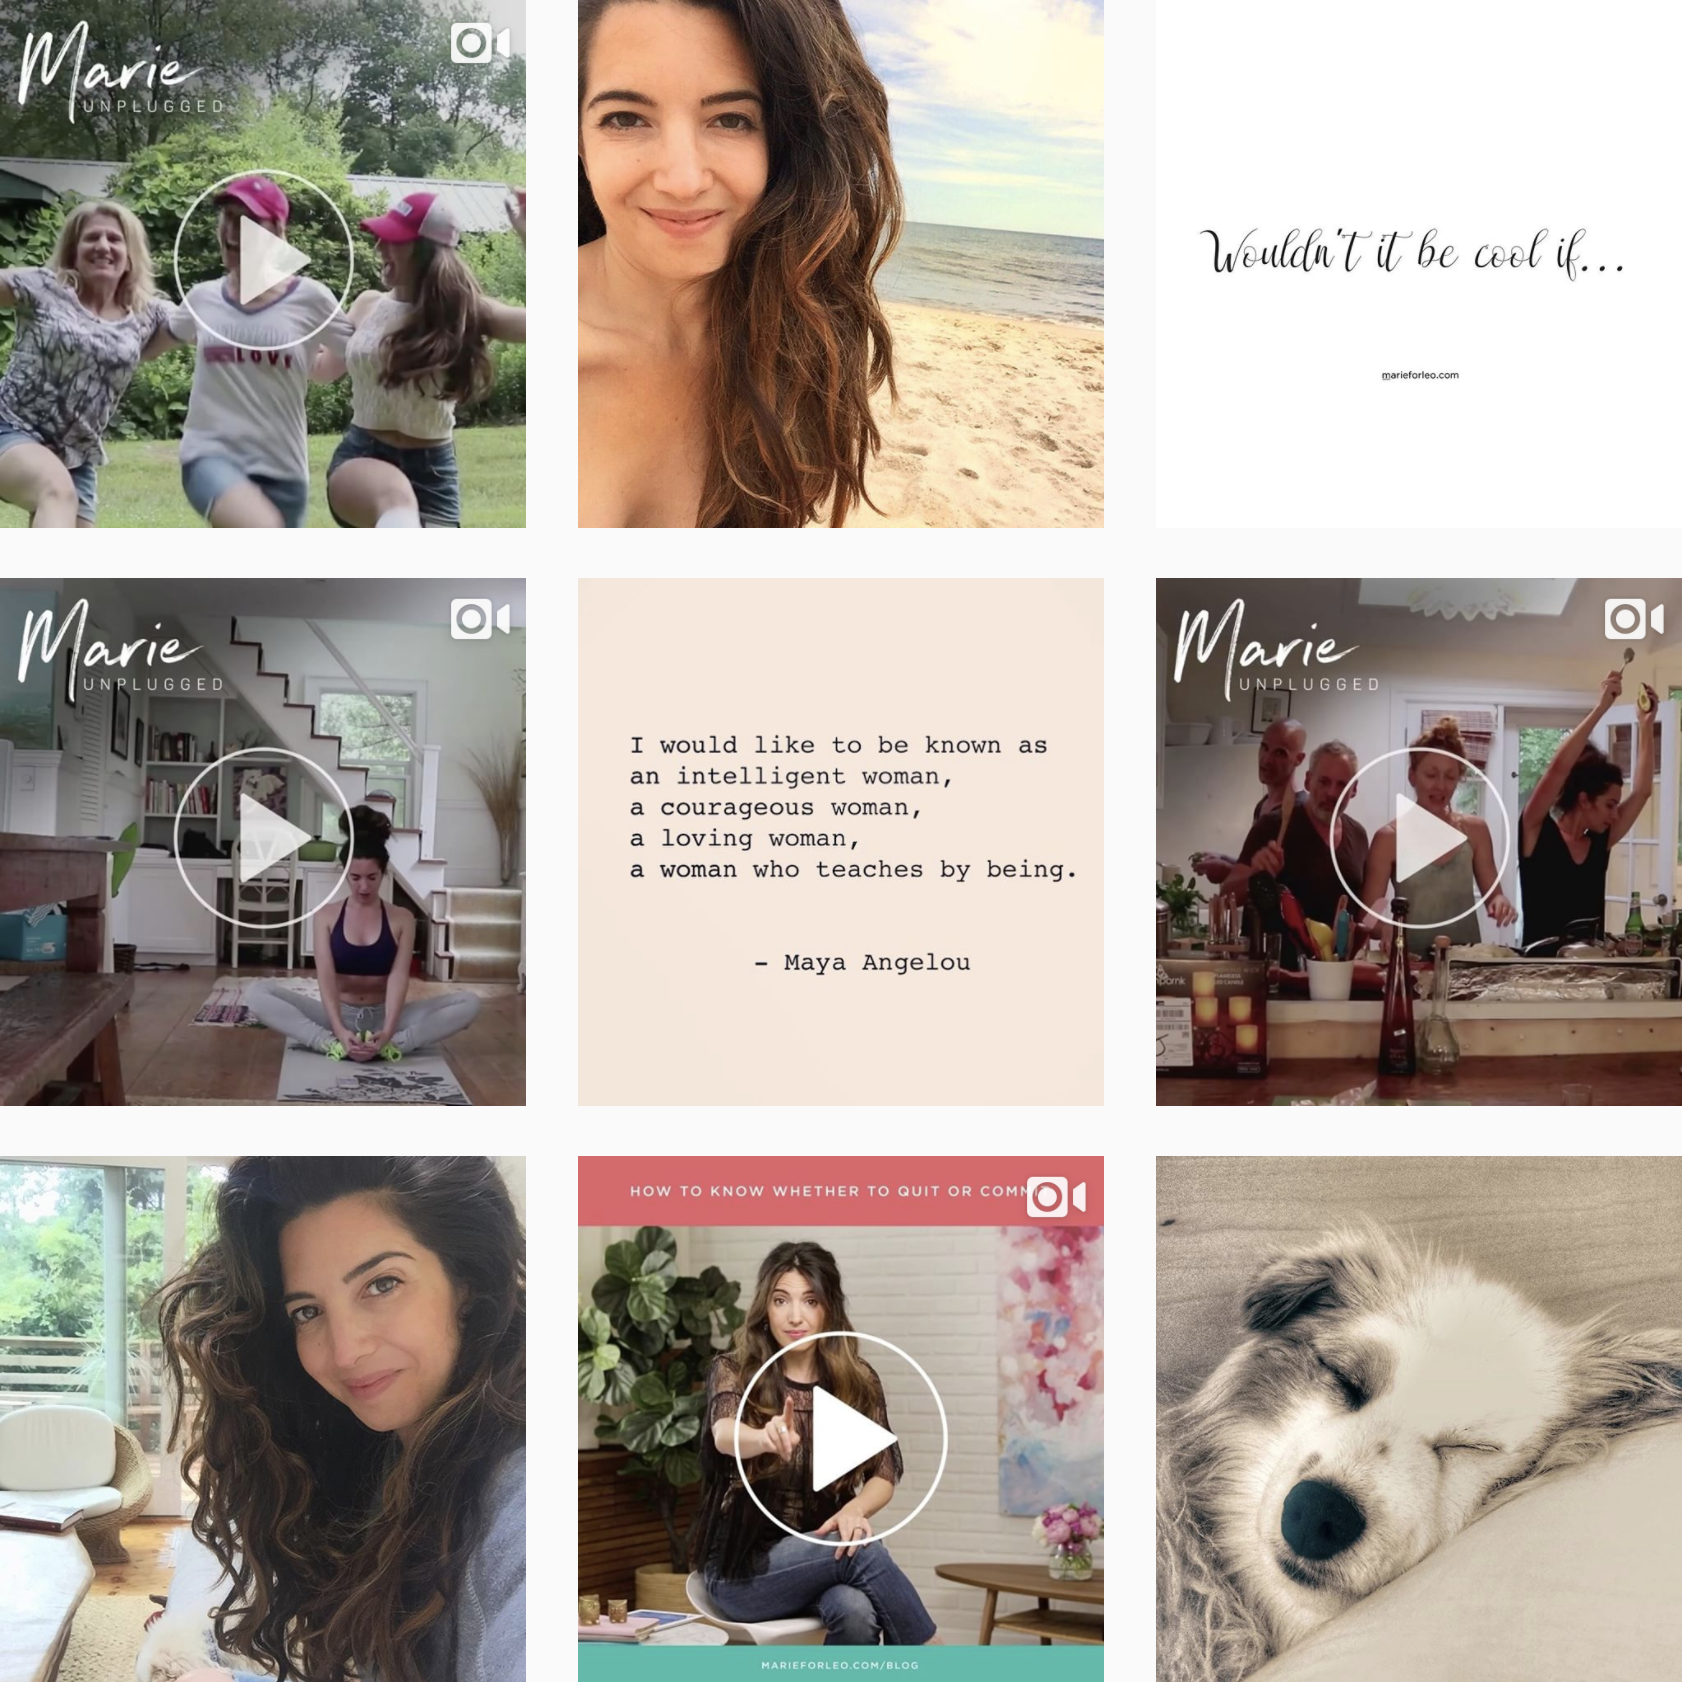 Marie Forleo's Instagram stream